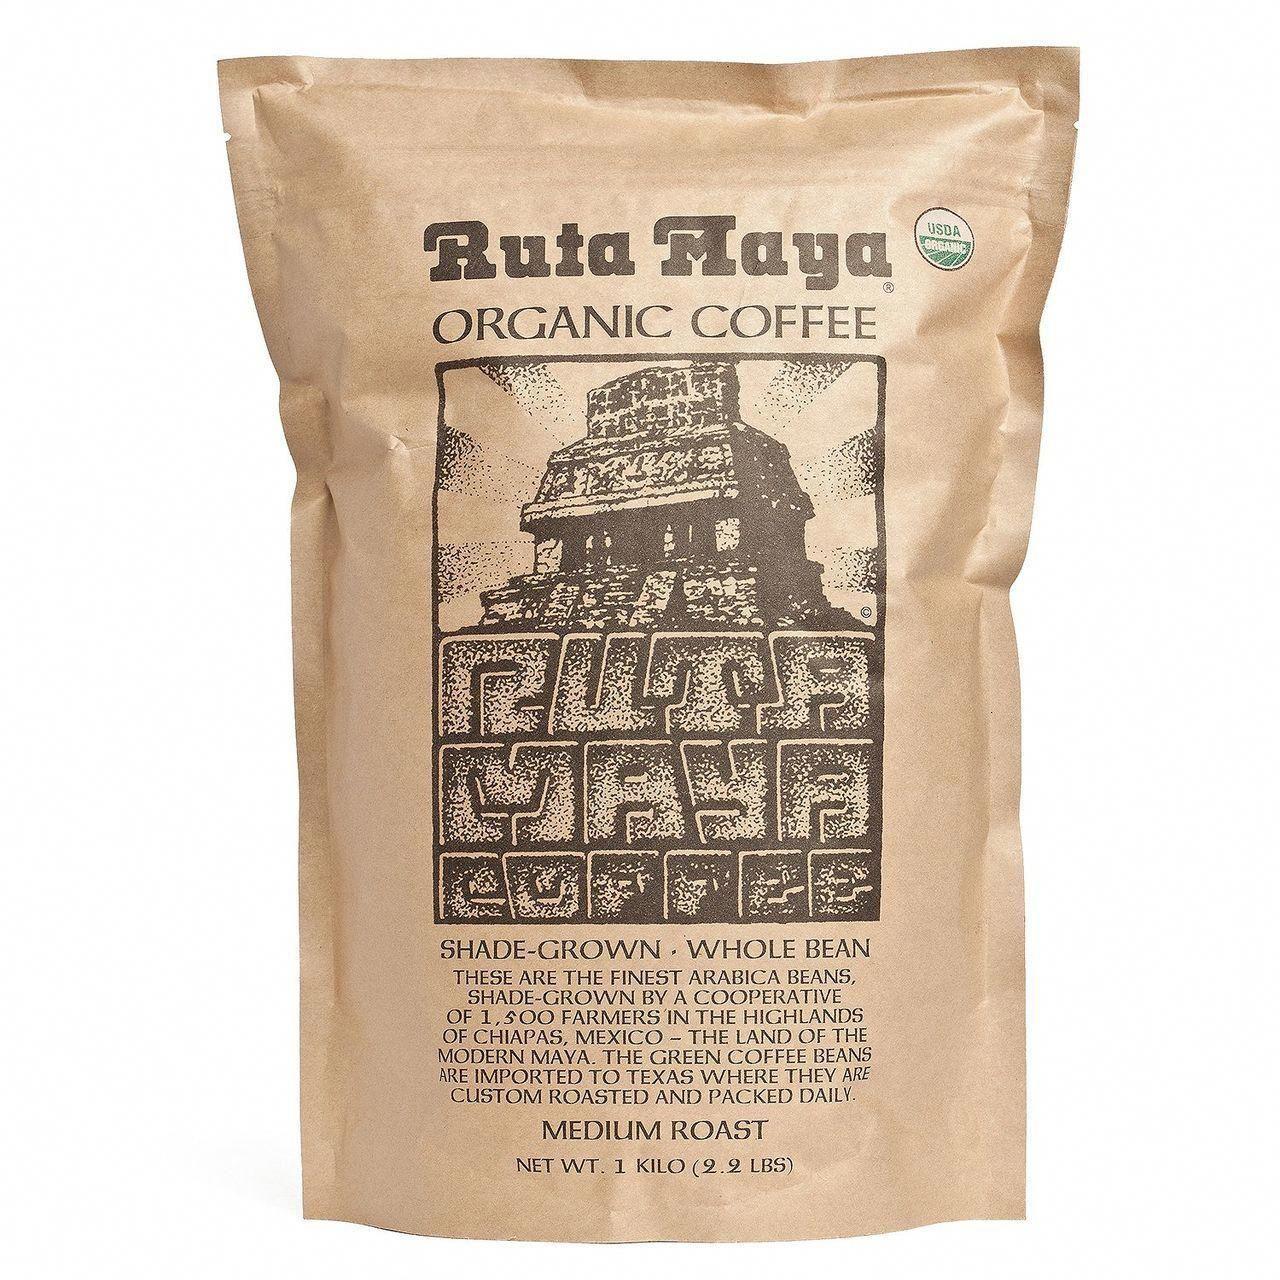 Ruta Maya Organic Coffee Bean Medium Roast, 2.2 lbs